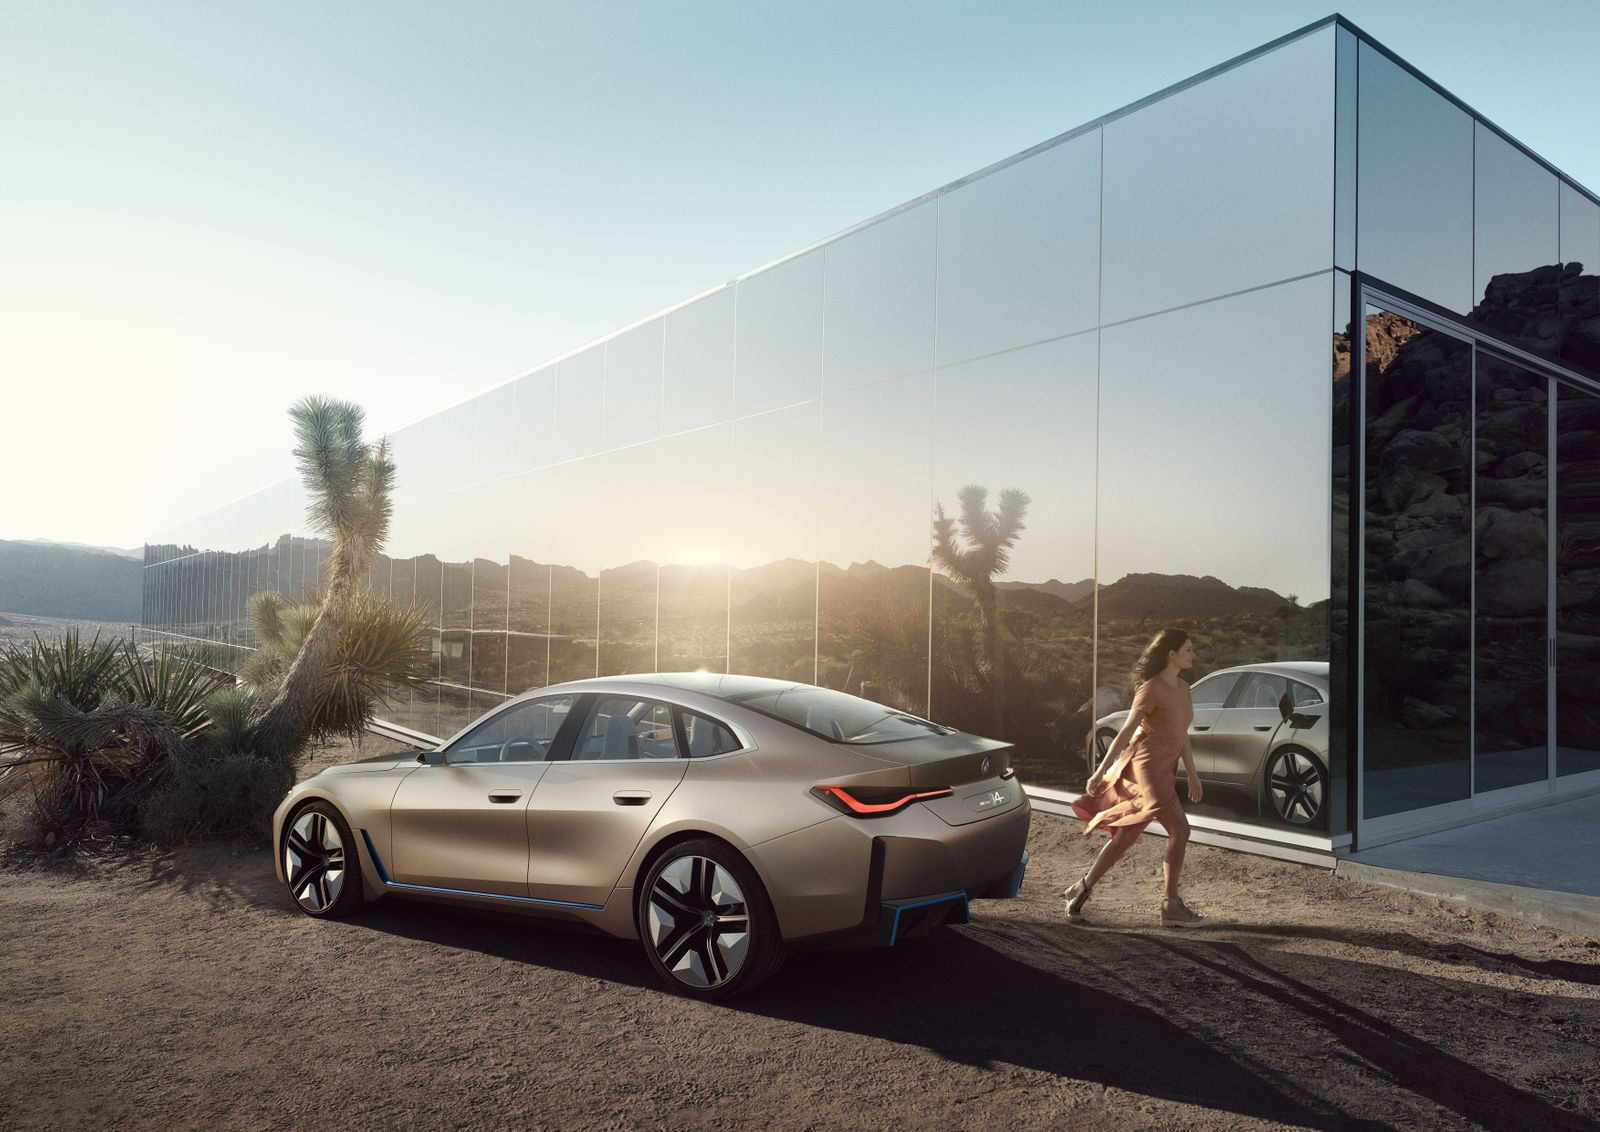 BMWi4 Concept